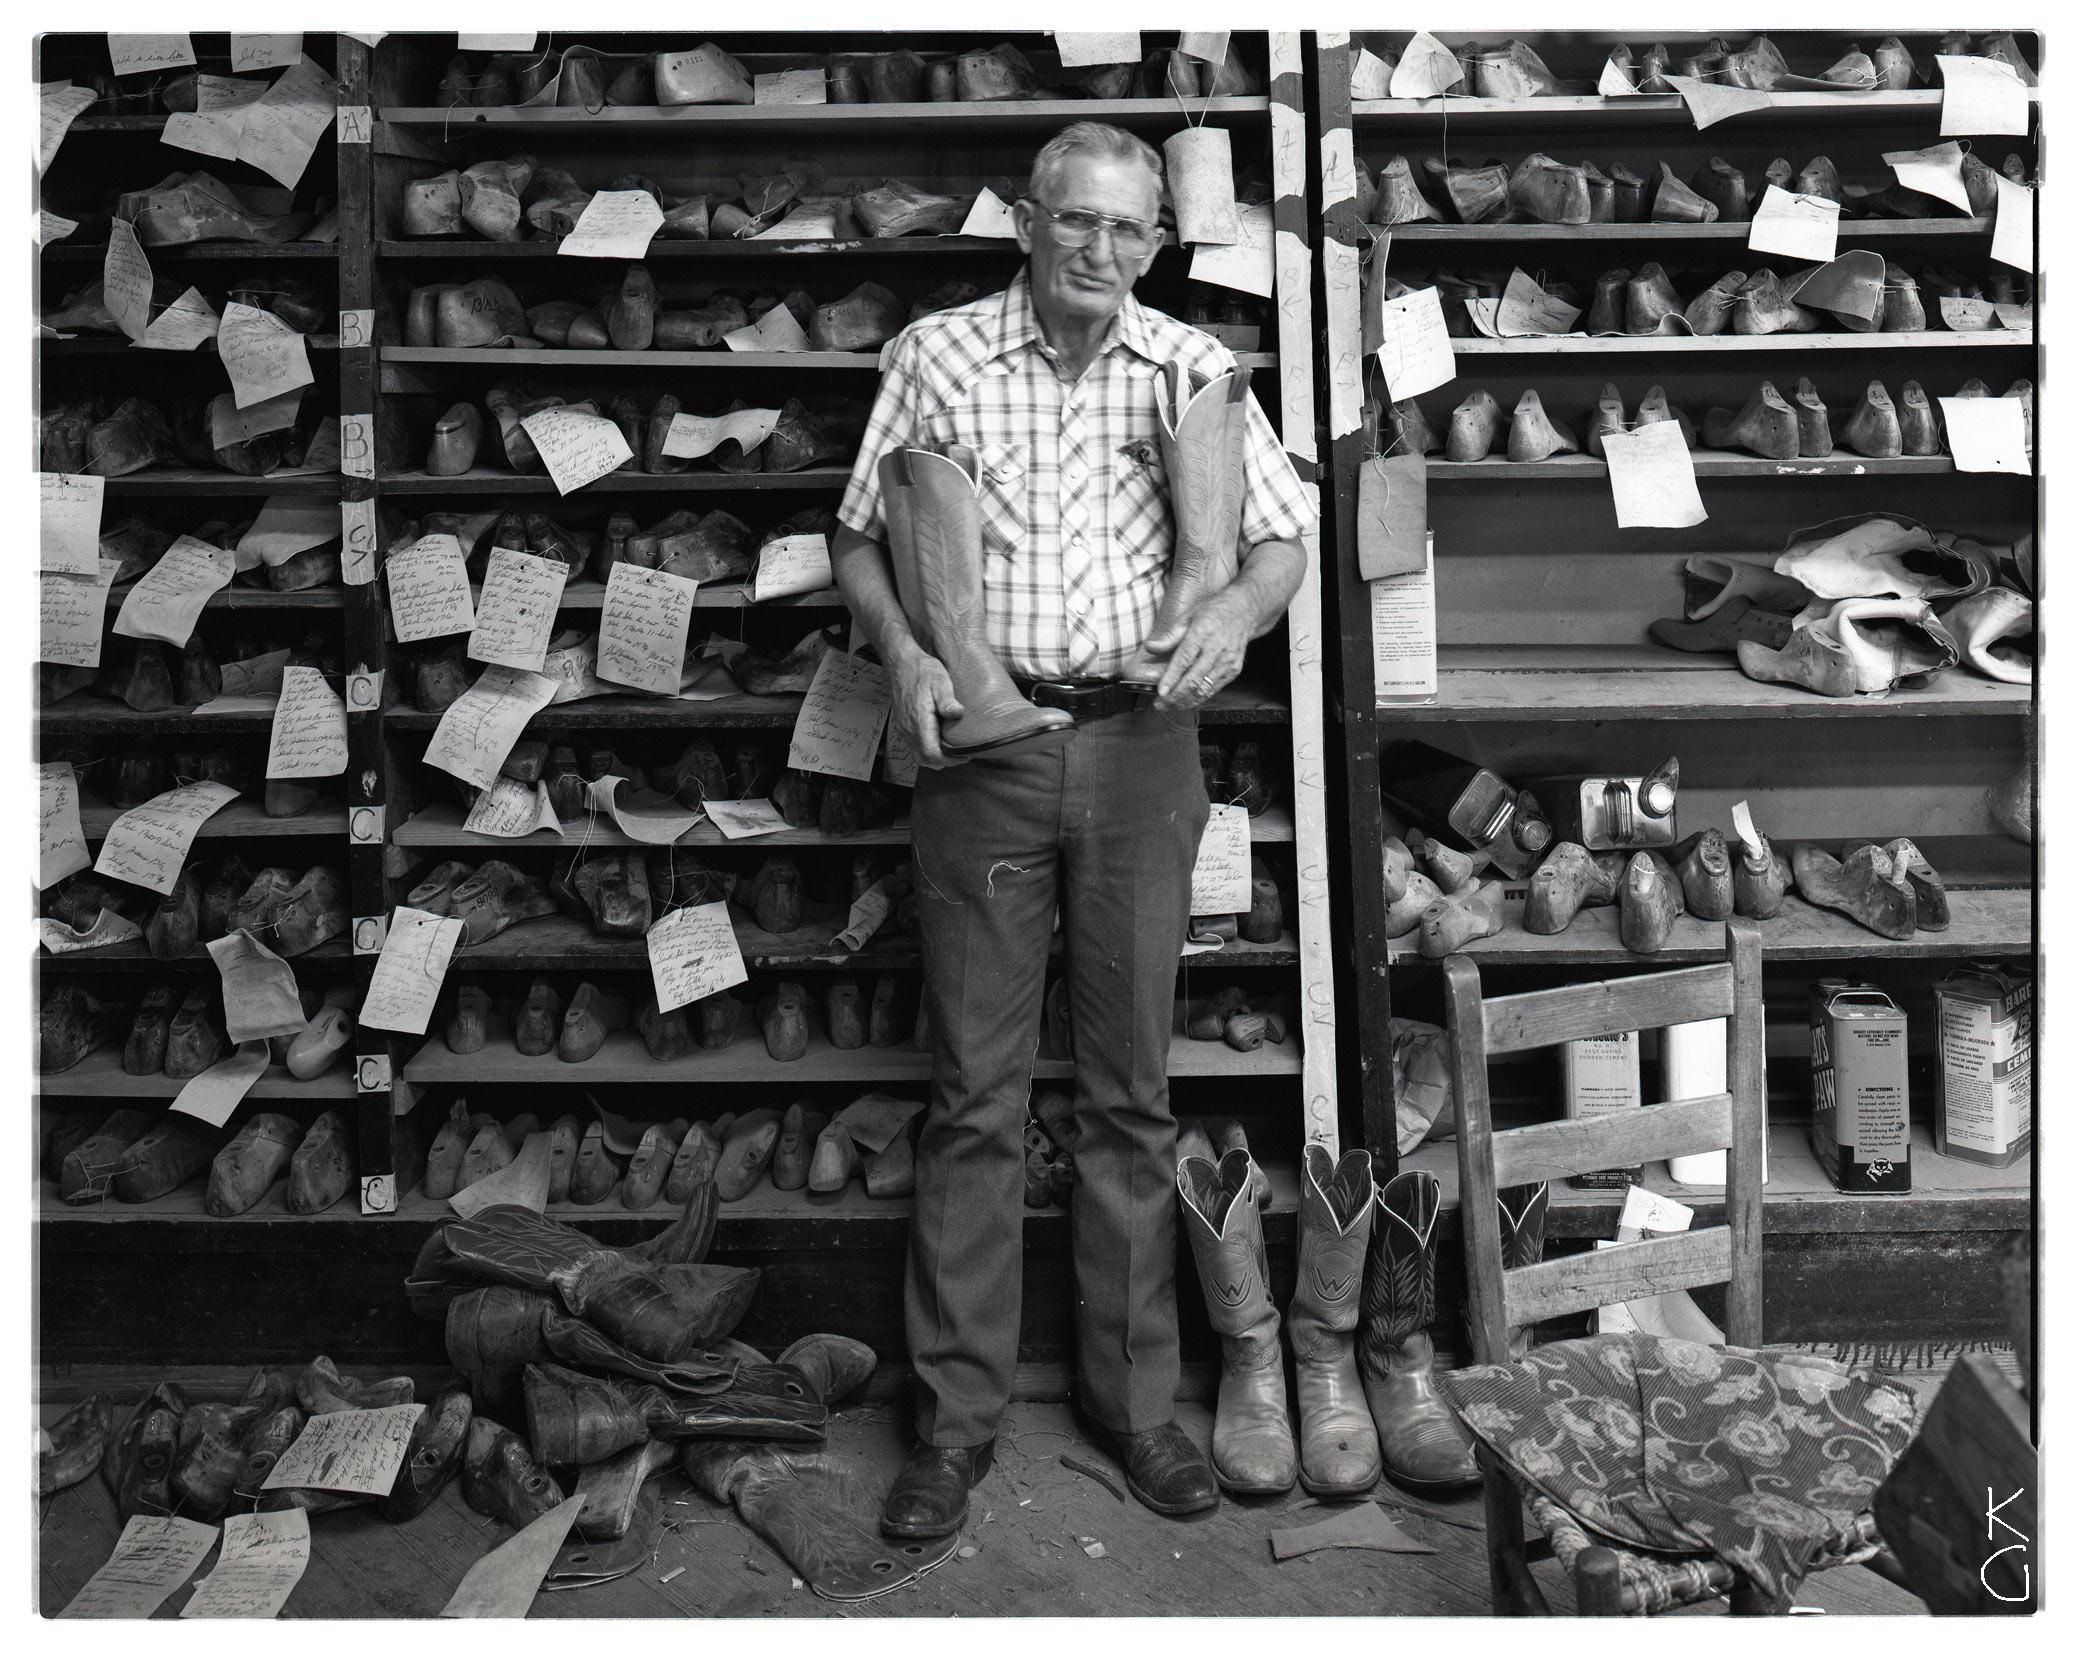 James Owen, Bootmaker, The Panhandle 1987